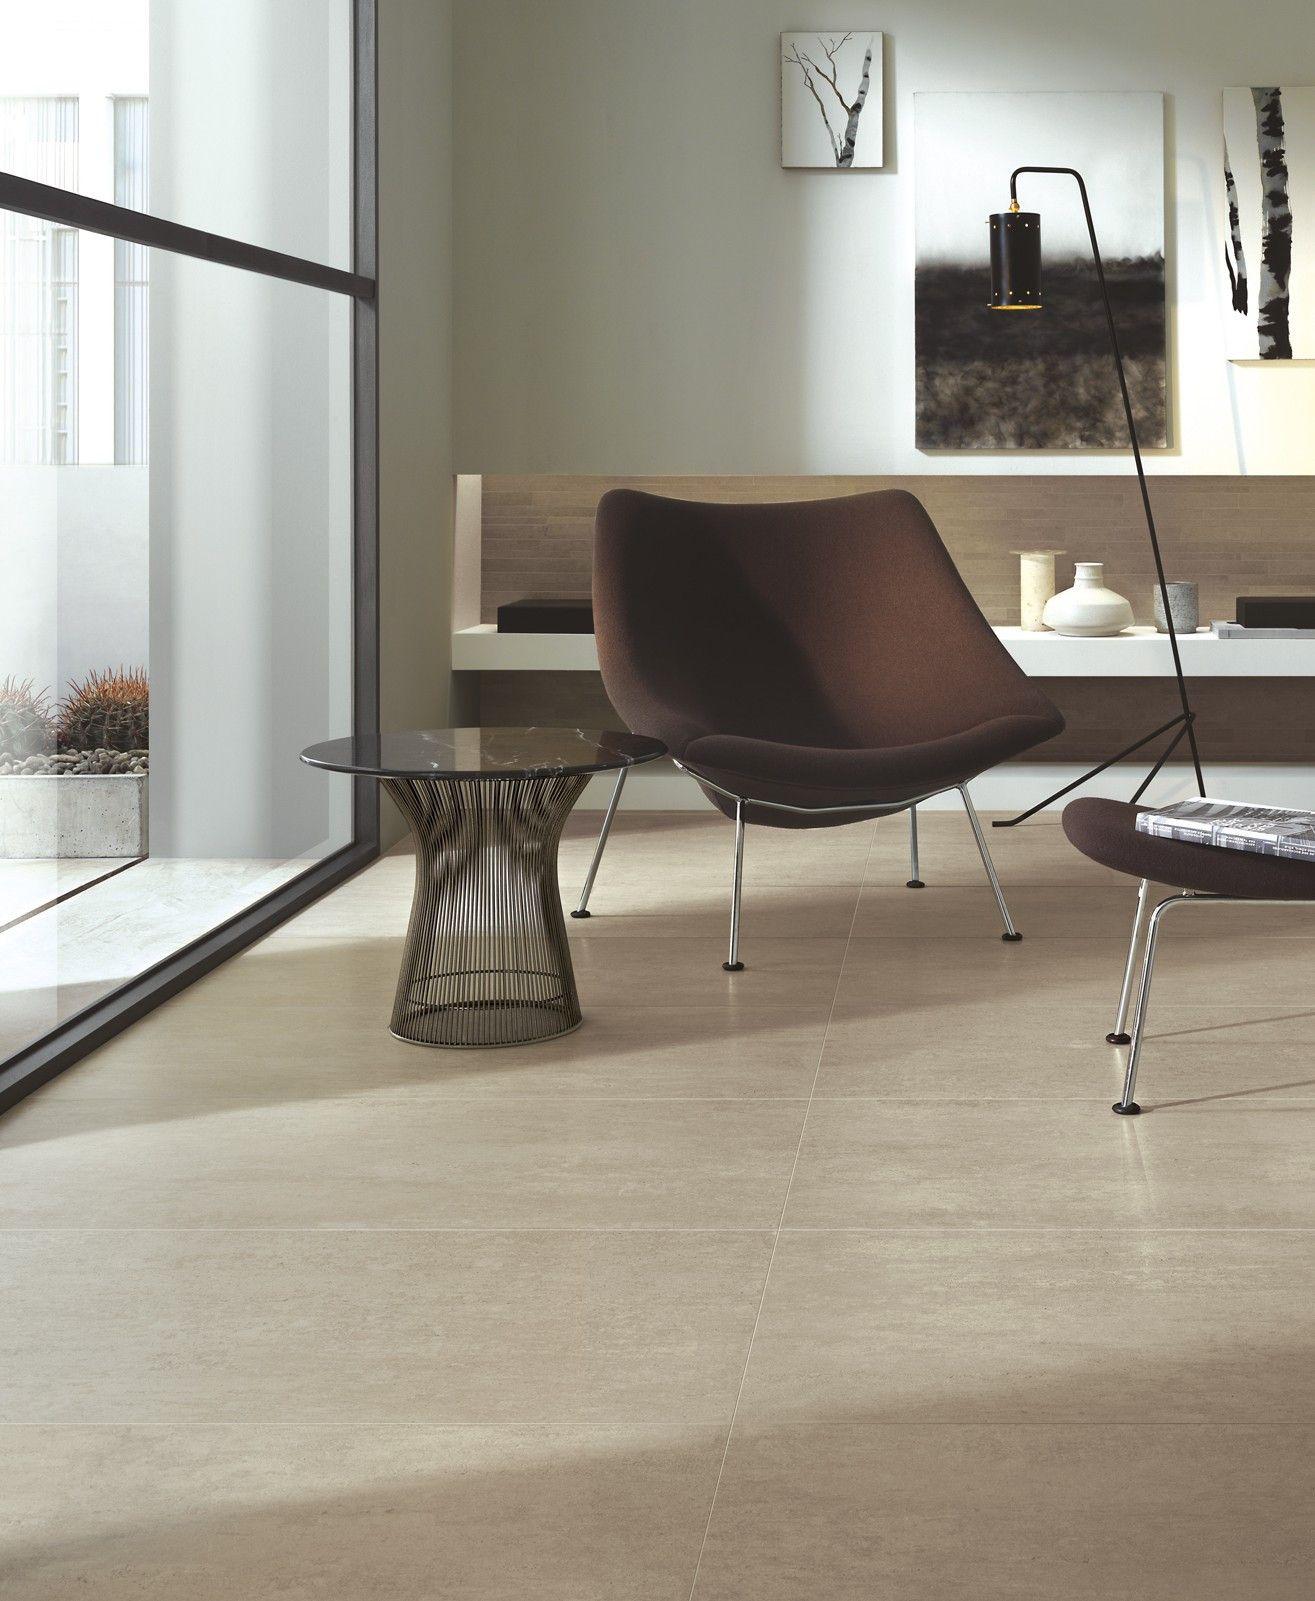 ragno #concept beige 30x120 cm r2jx | #feinsteinzeug #betonoptik, Badezimmer ideen